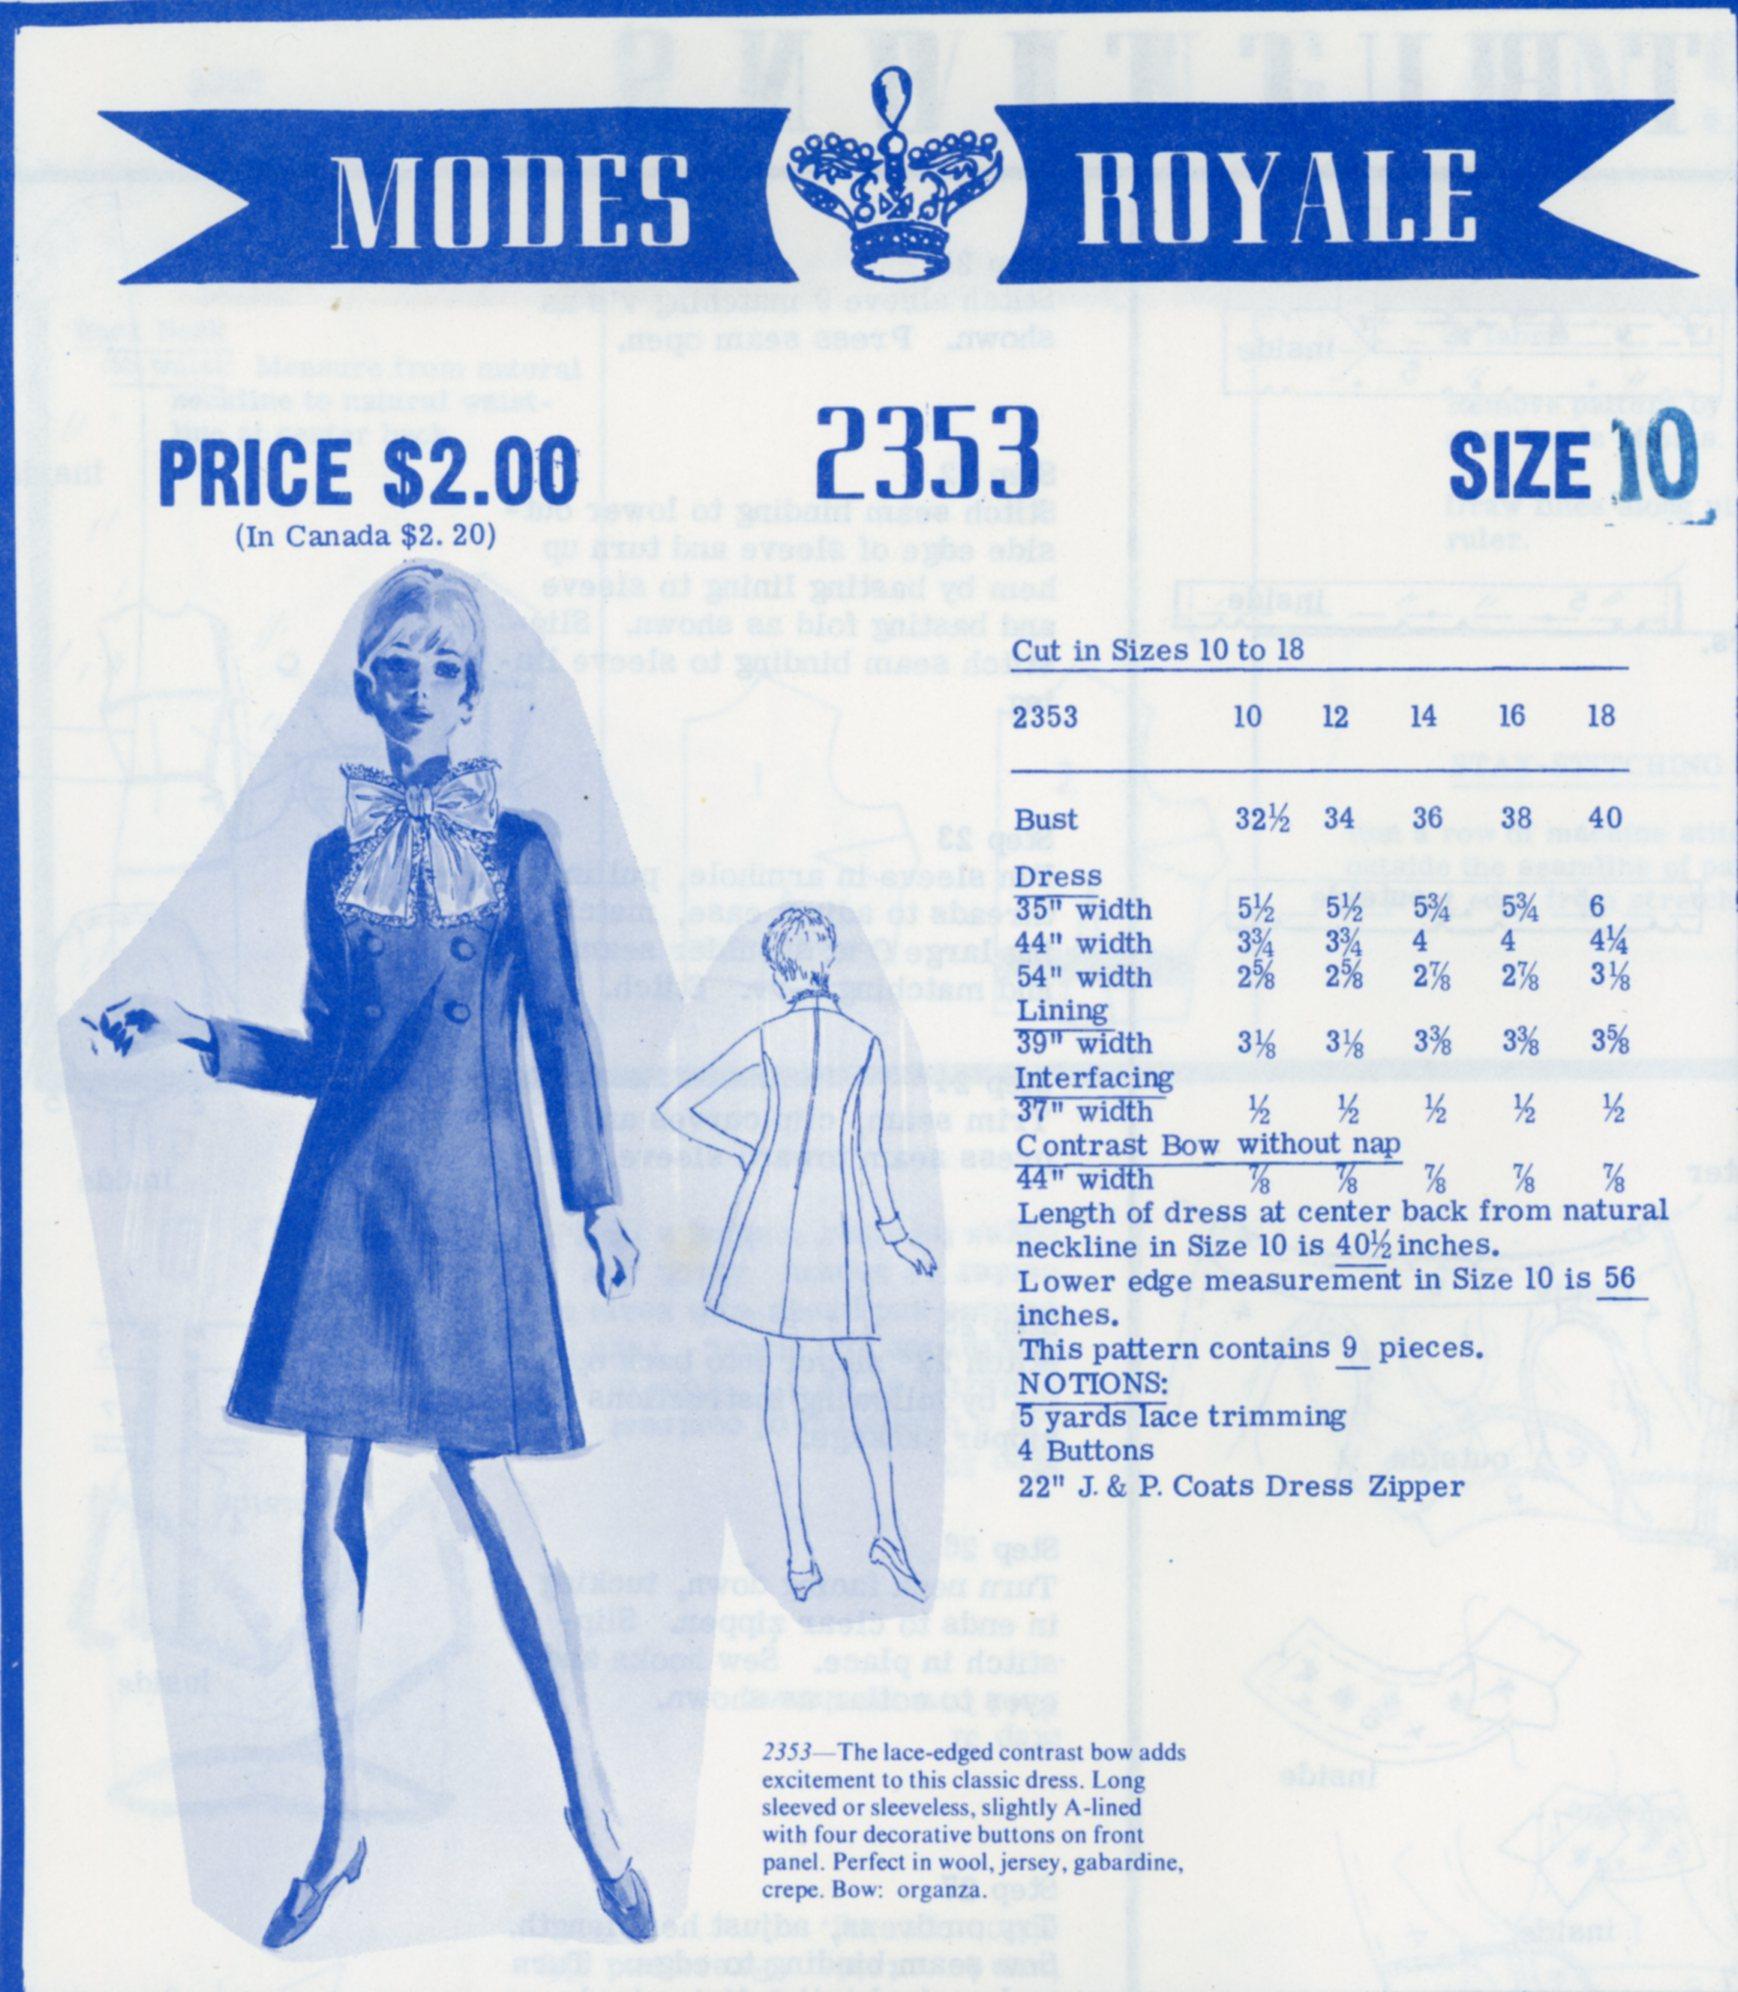 Modes Royale 2353